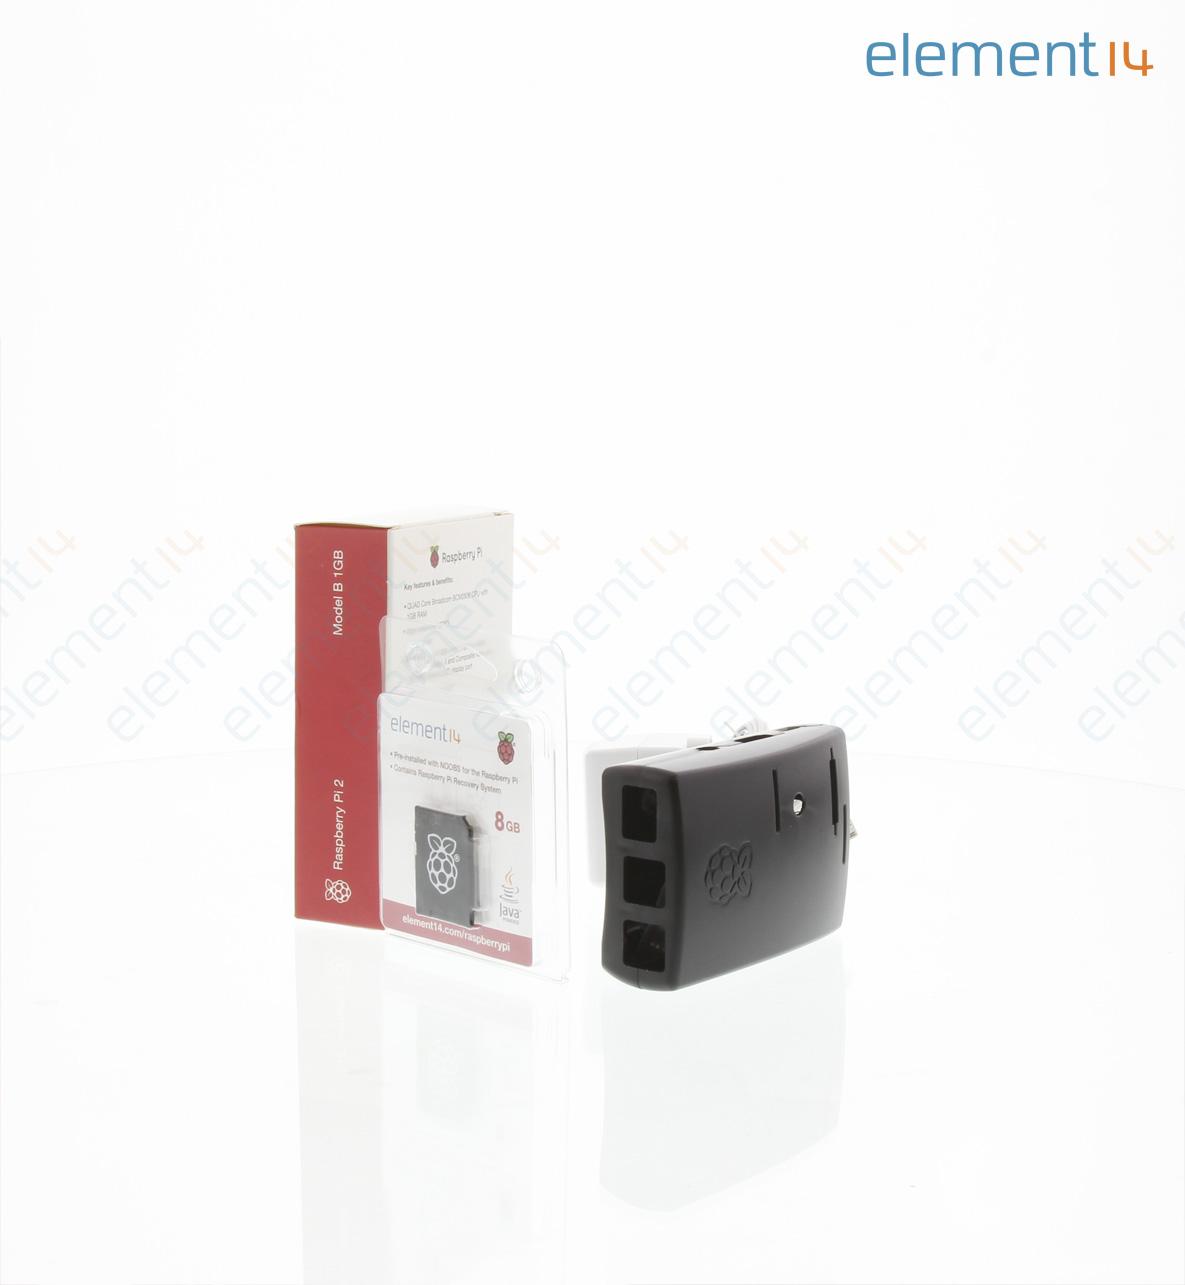 Kit Pi2 Mathworks Starter Rpi Element14 Paket Raspberry Pi 2 Und 3 Model B